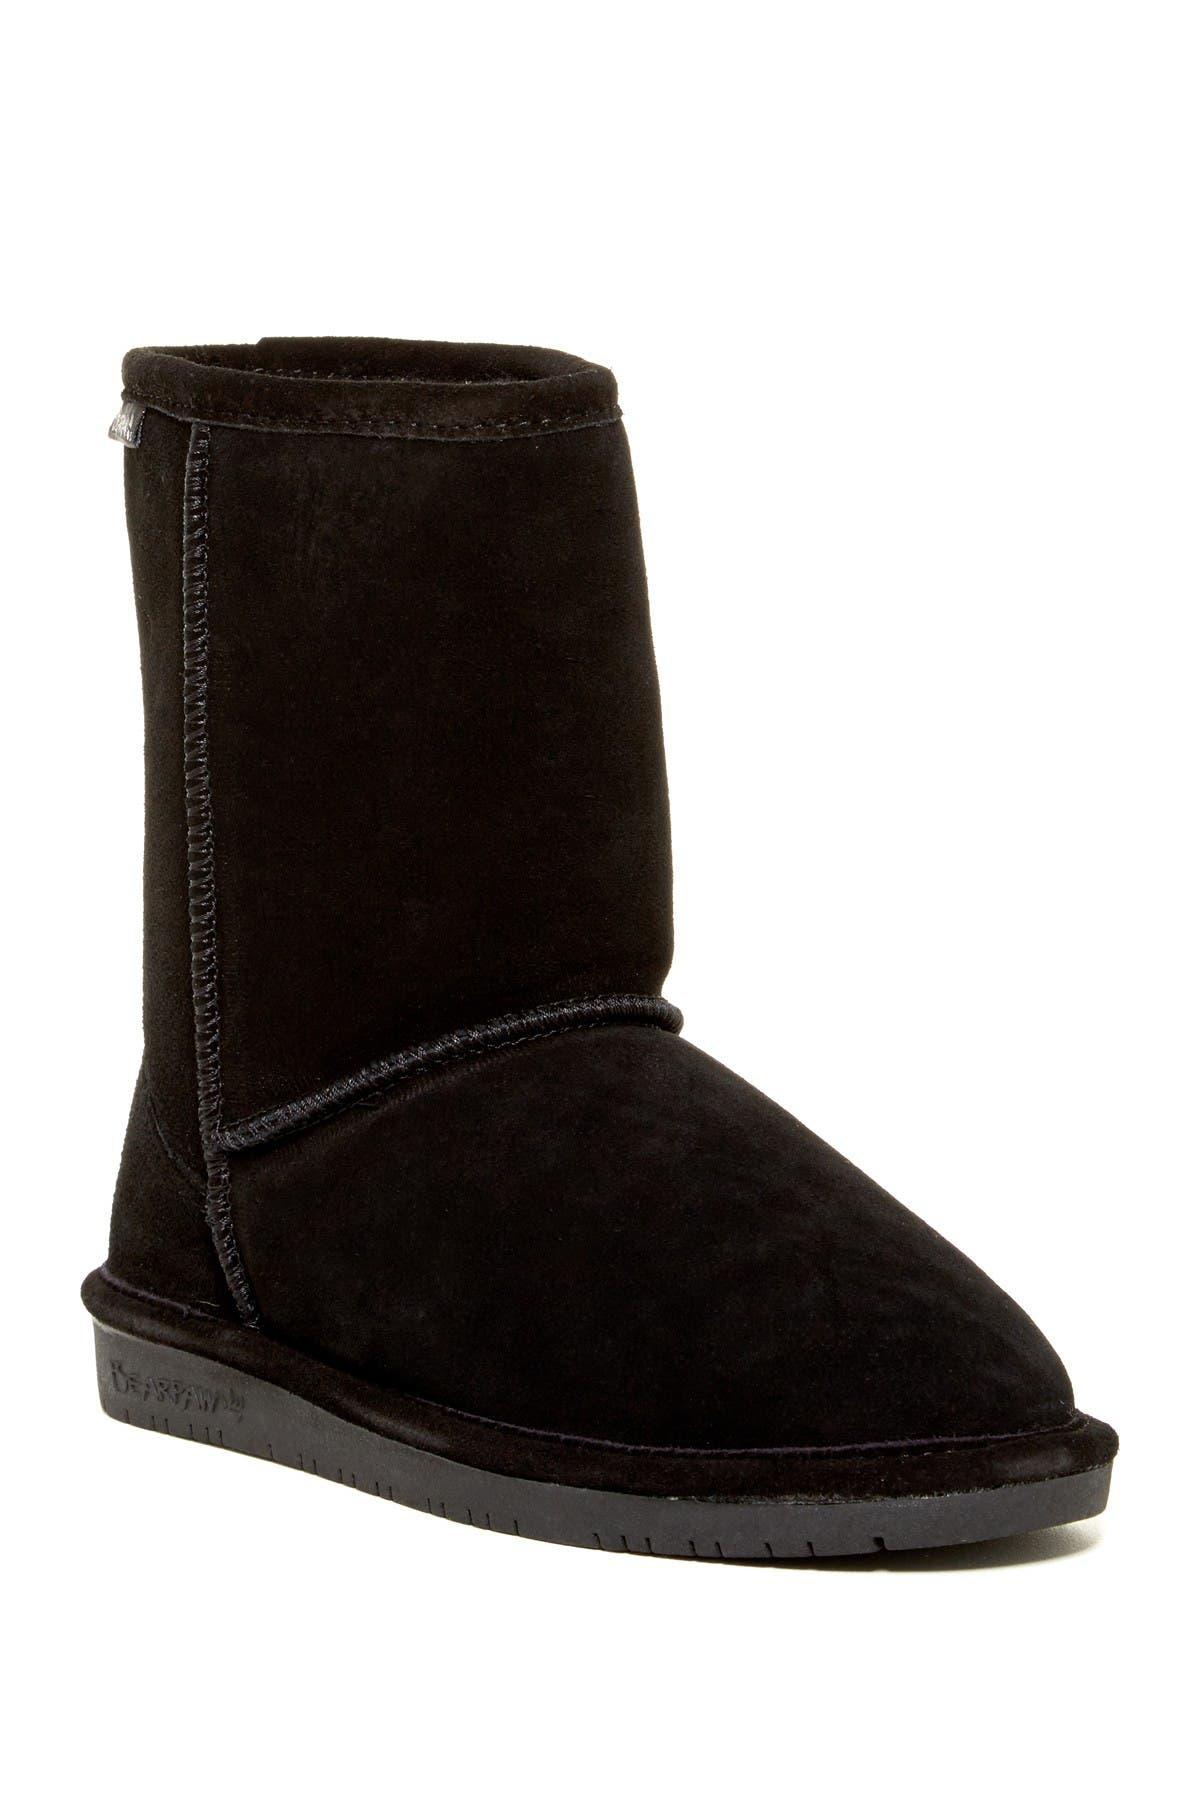 Image of BEARPAW Emma Wool & Genuine Sheepskin Lined Boot